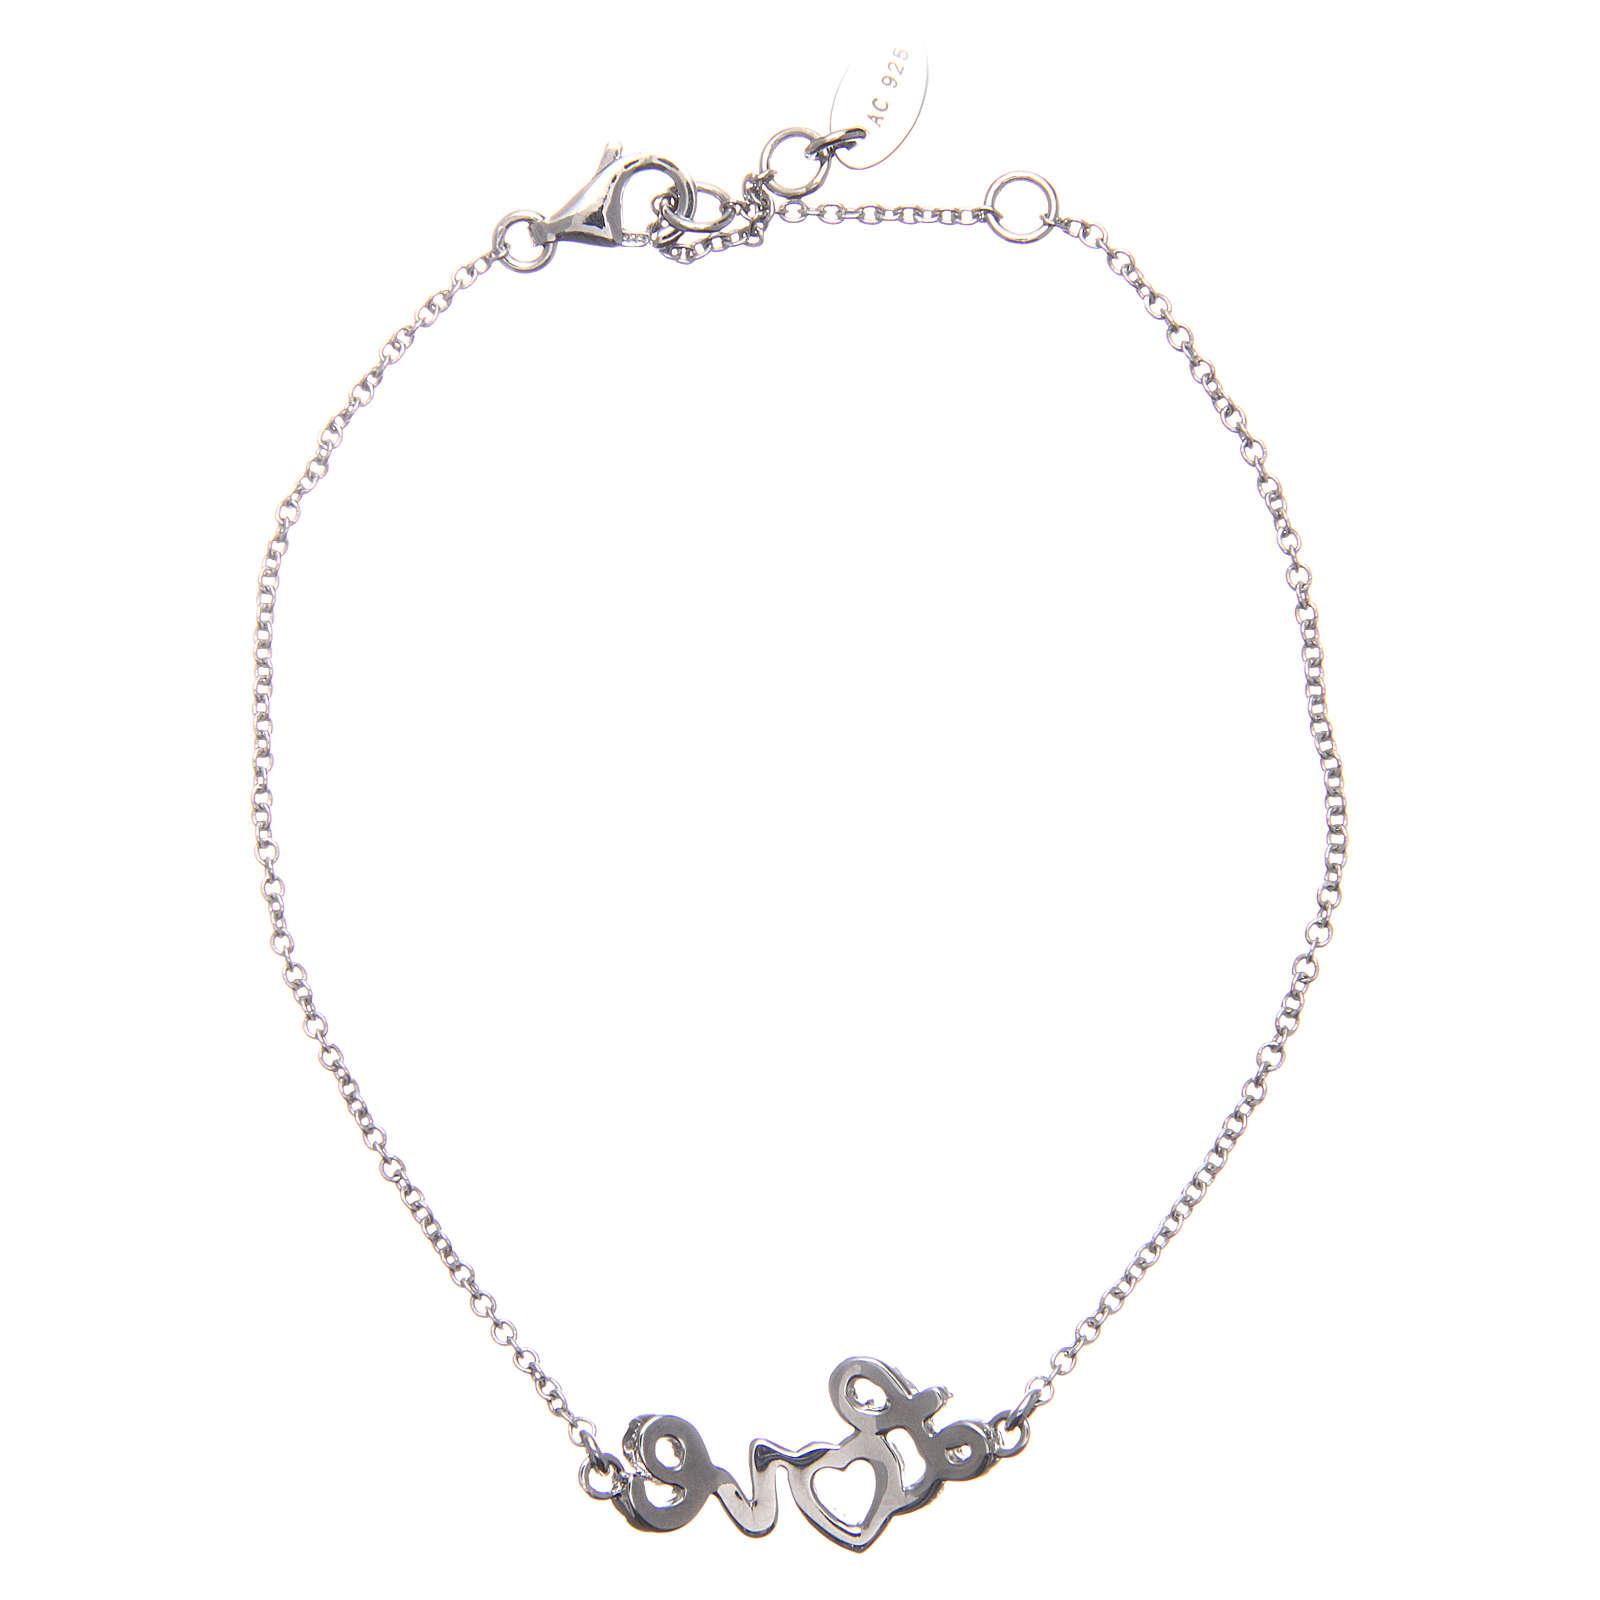 Bracciale AMEN argento 925 rodio love zirconi bianchi 4